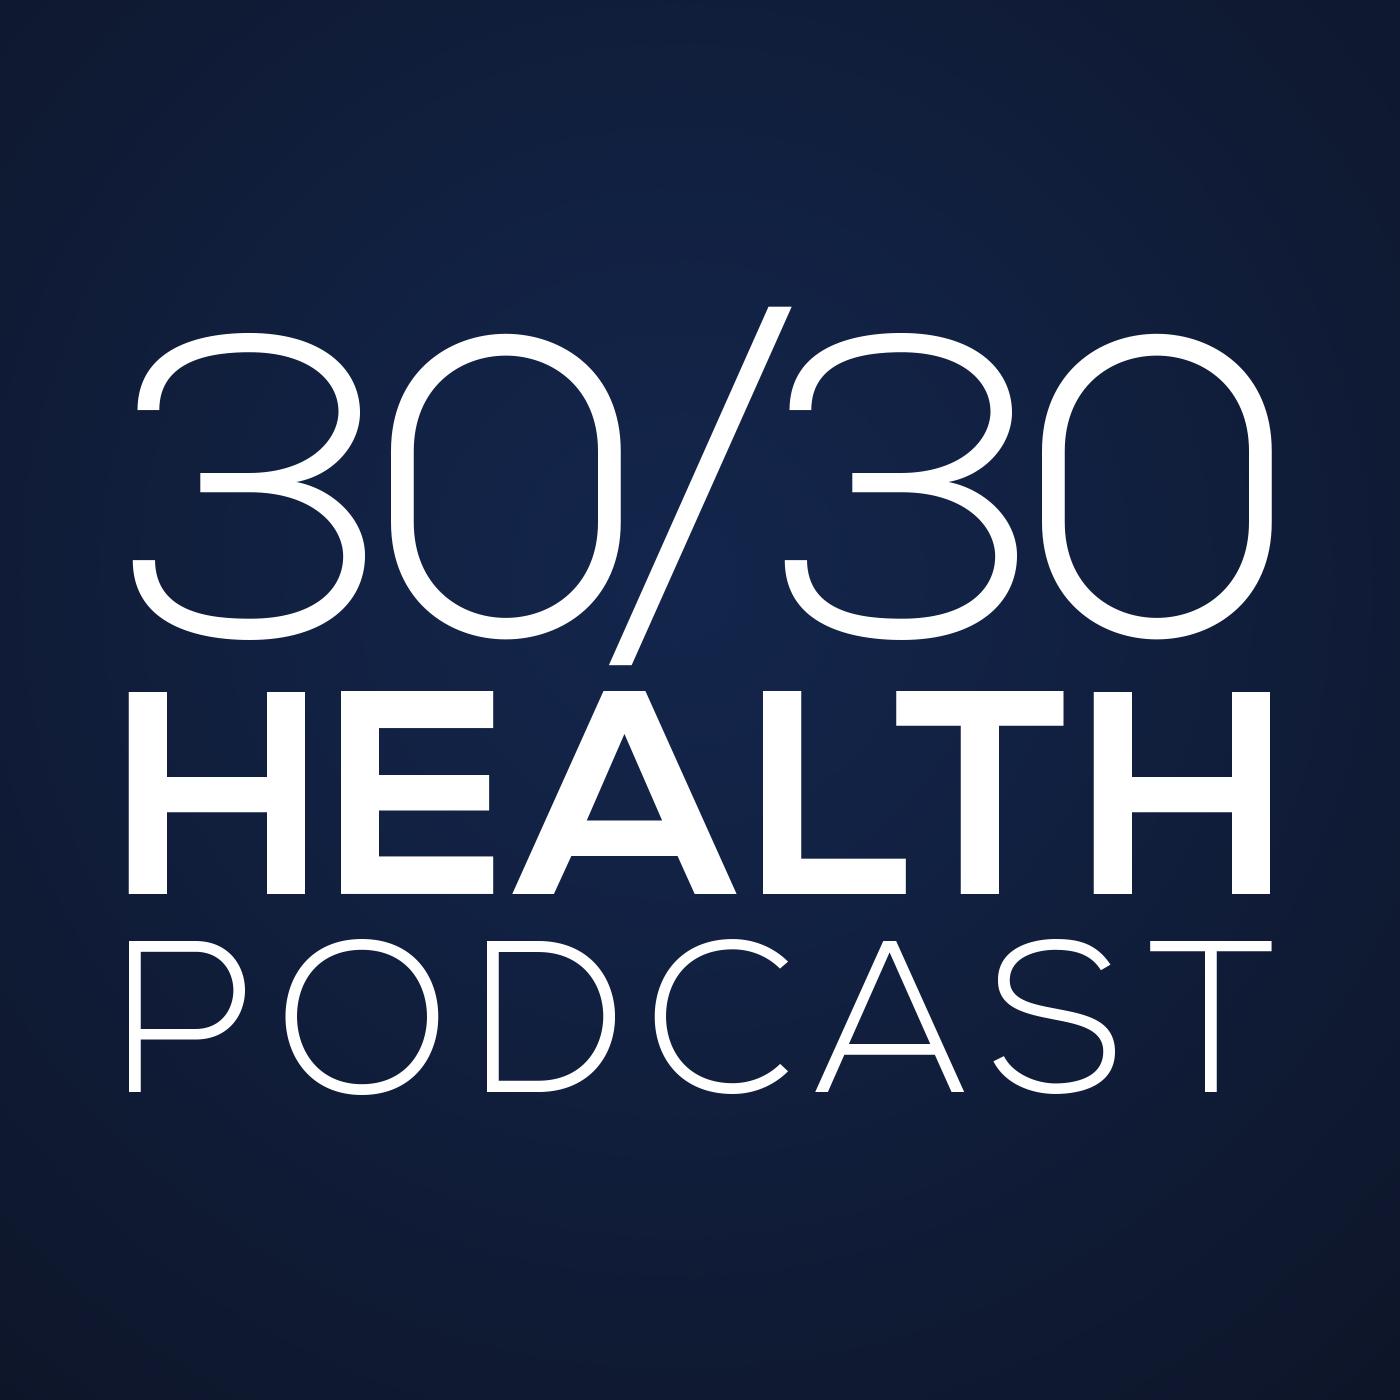 30/30 Health Podcast show art